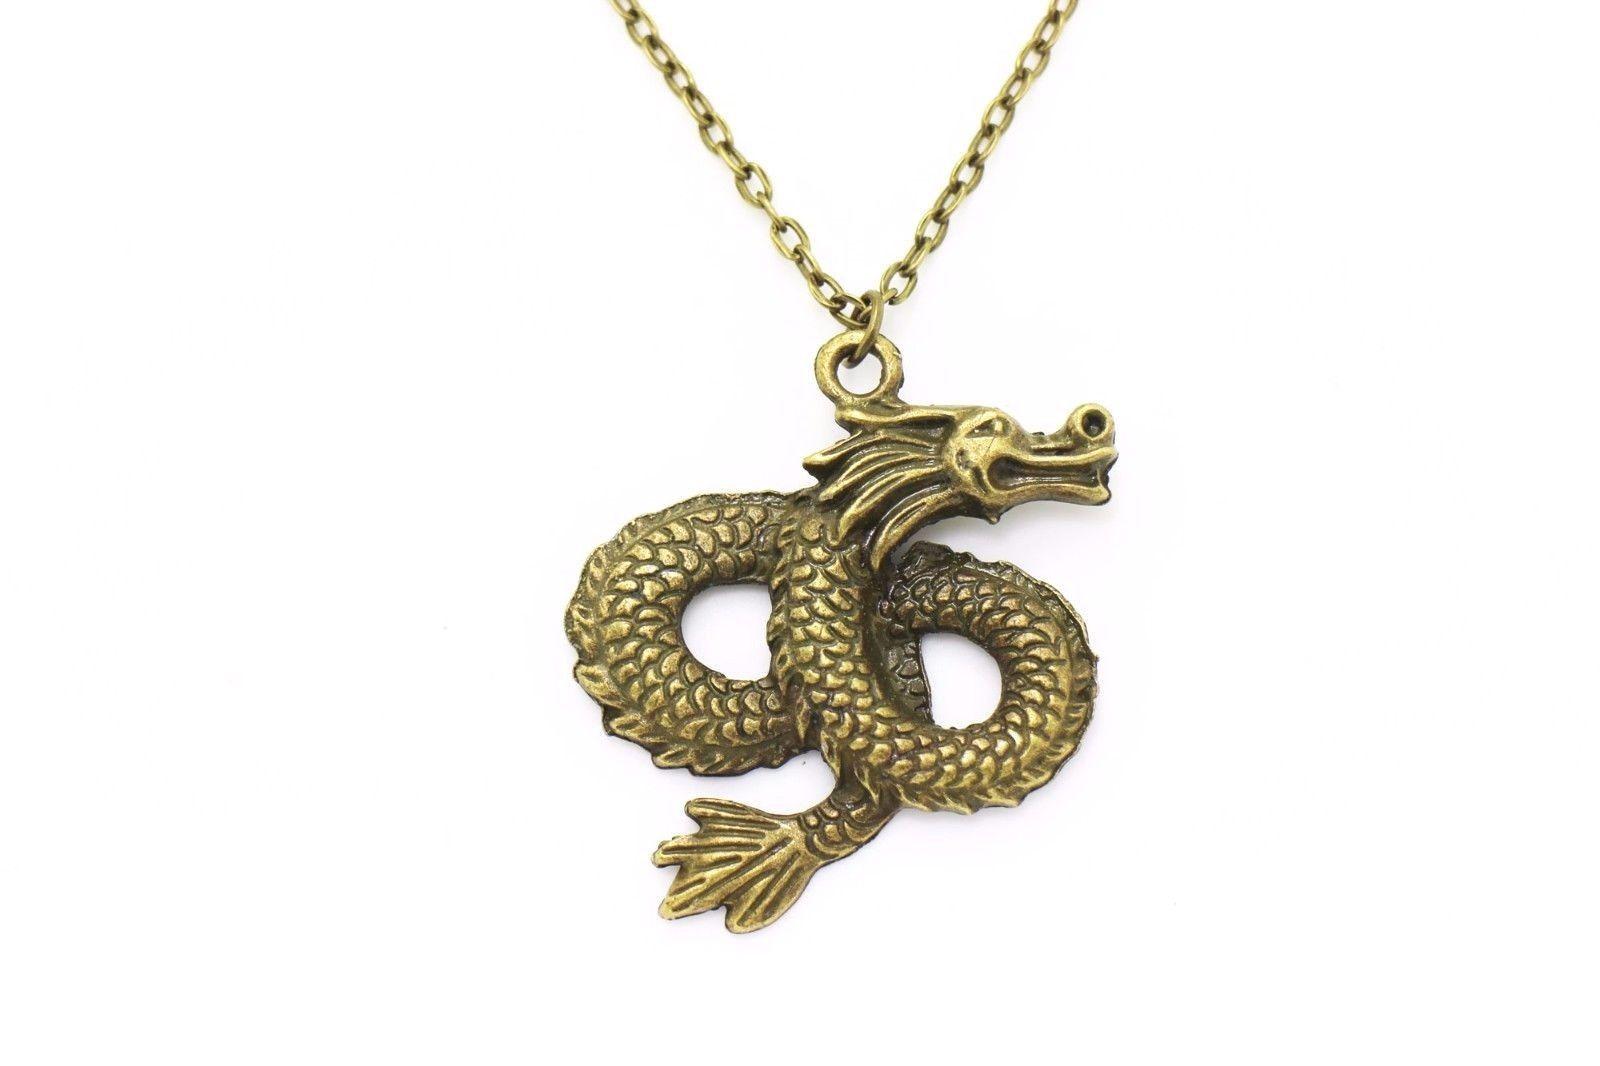 Chinese dragon dangling earrings men necklace set large pendant